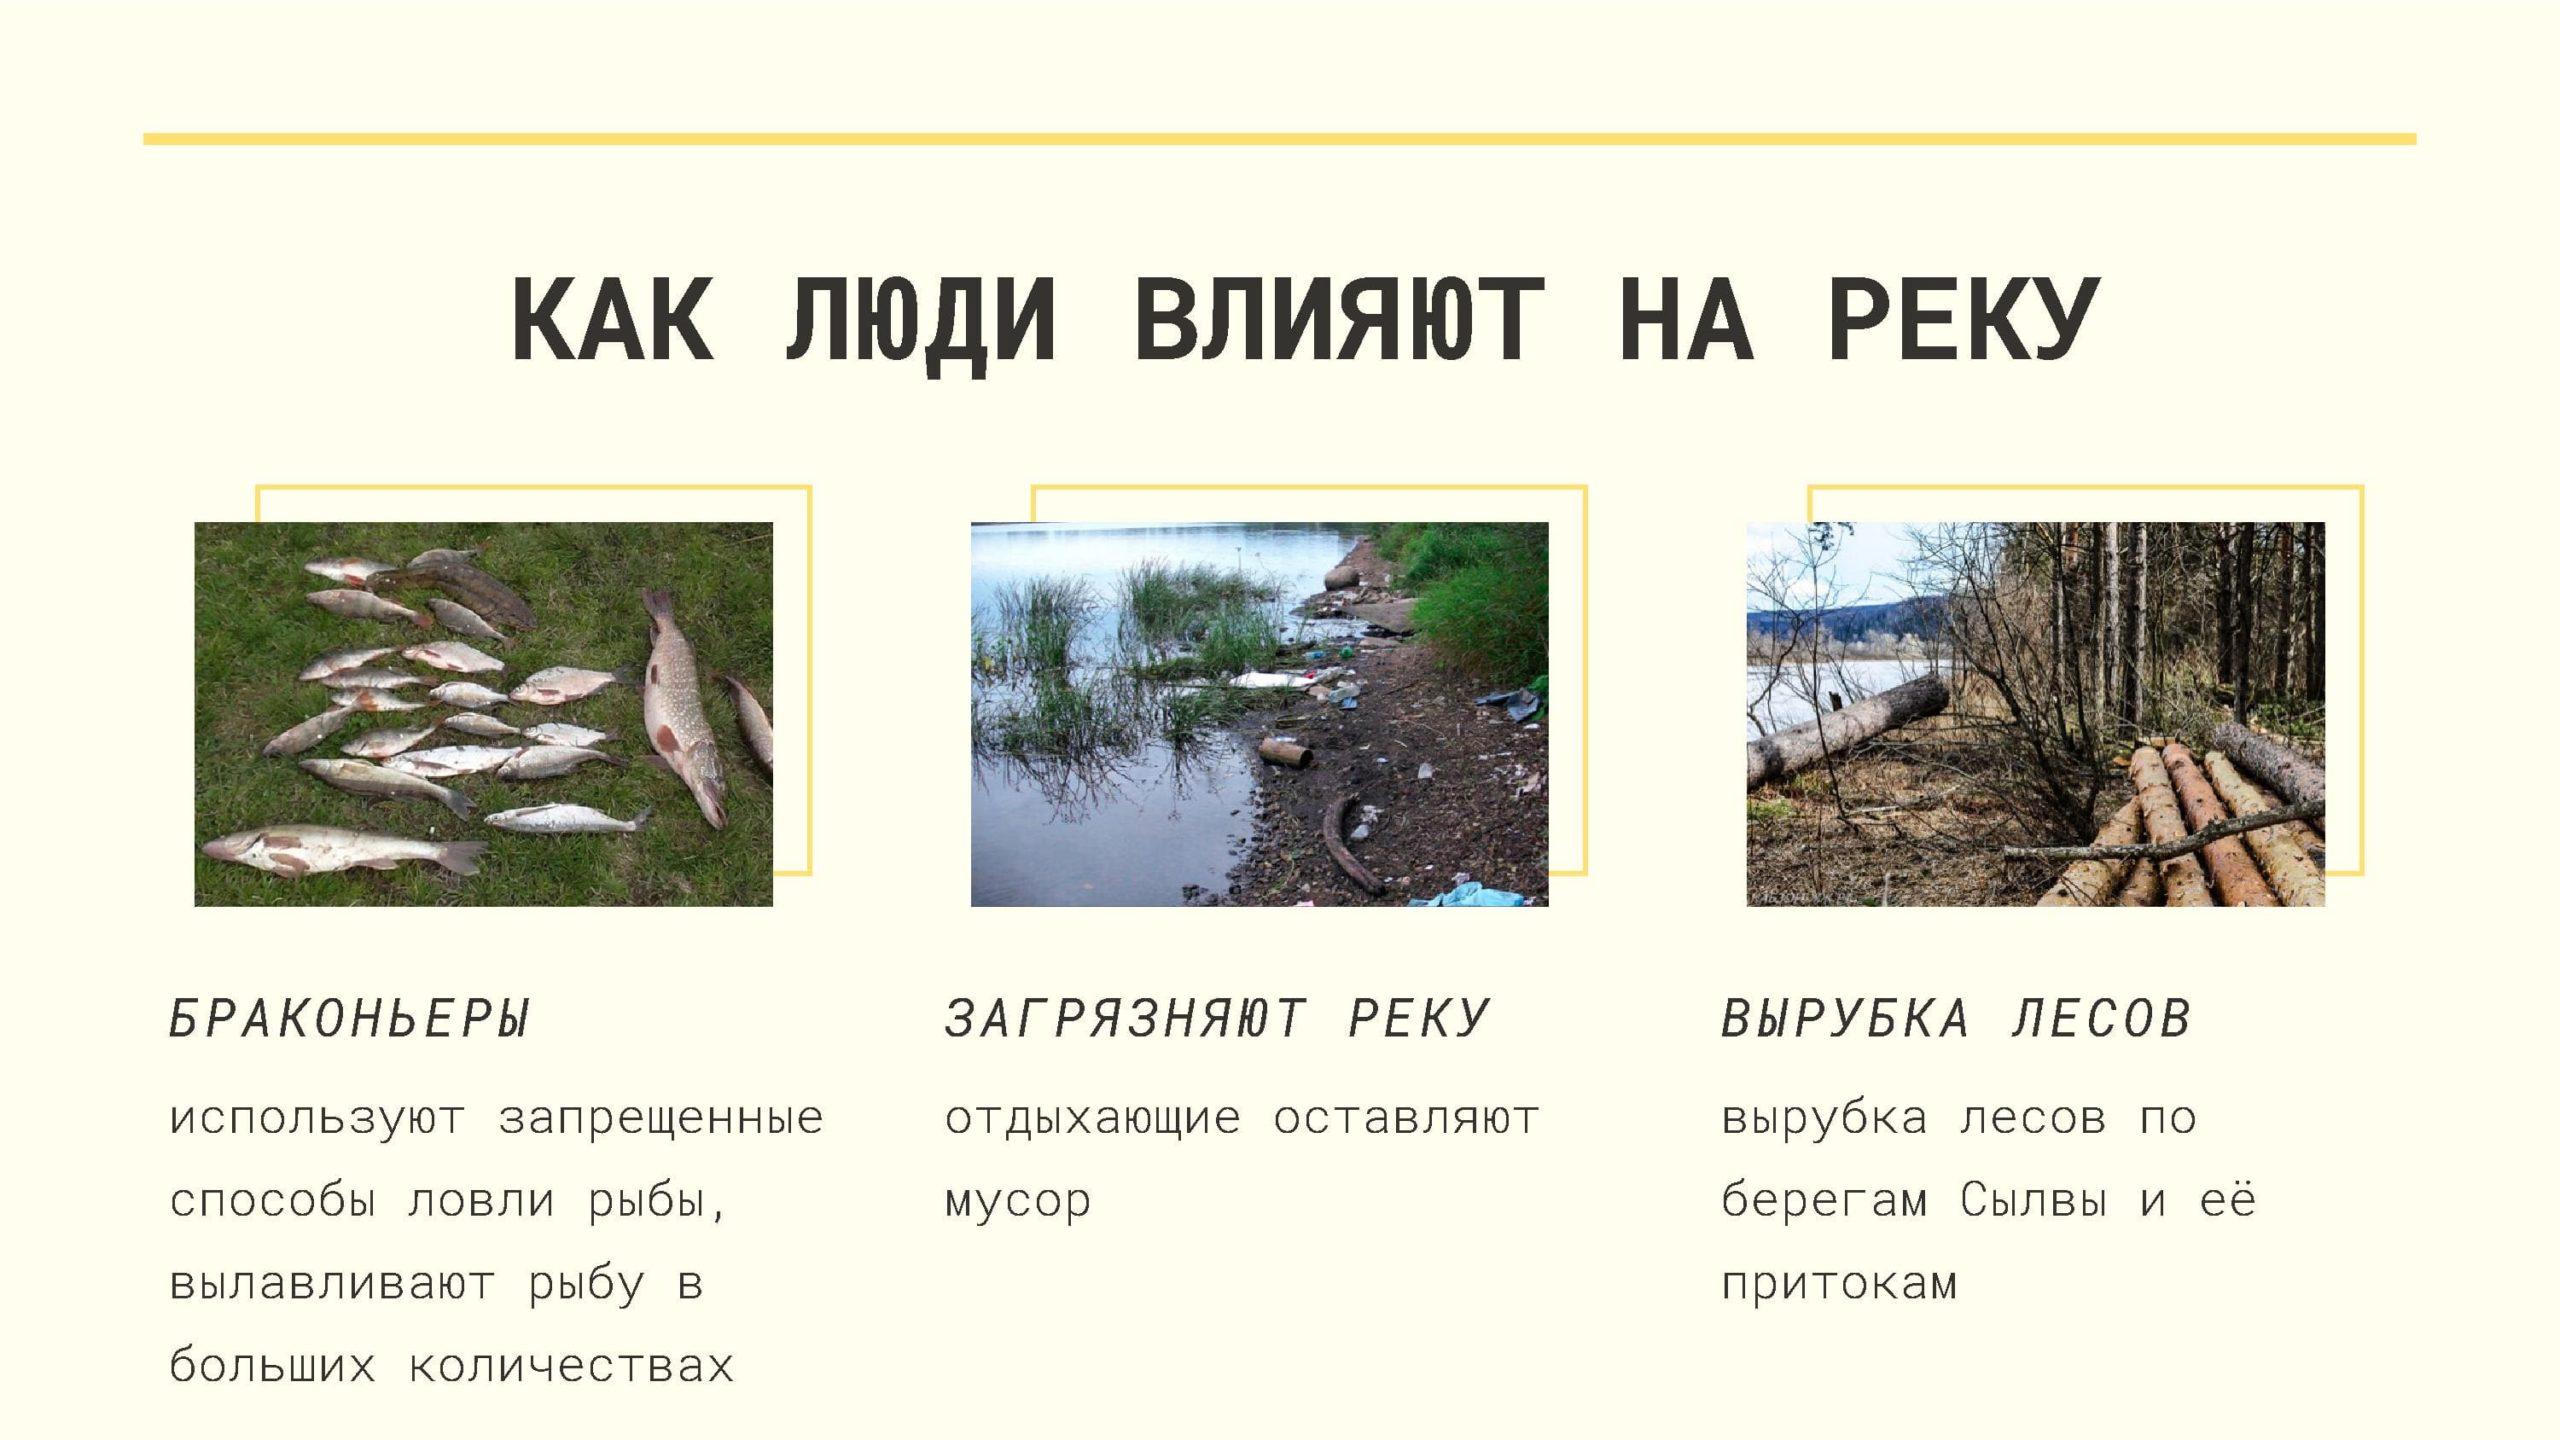 Как влияют на реку